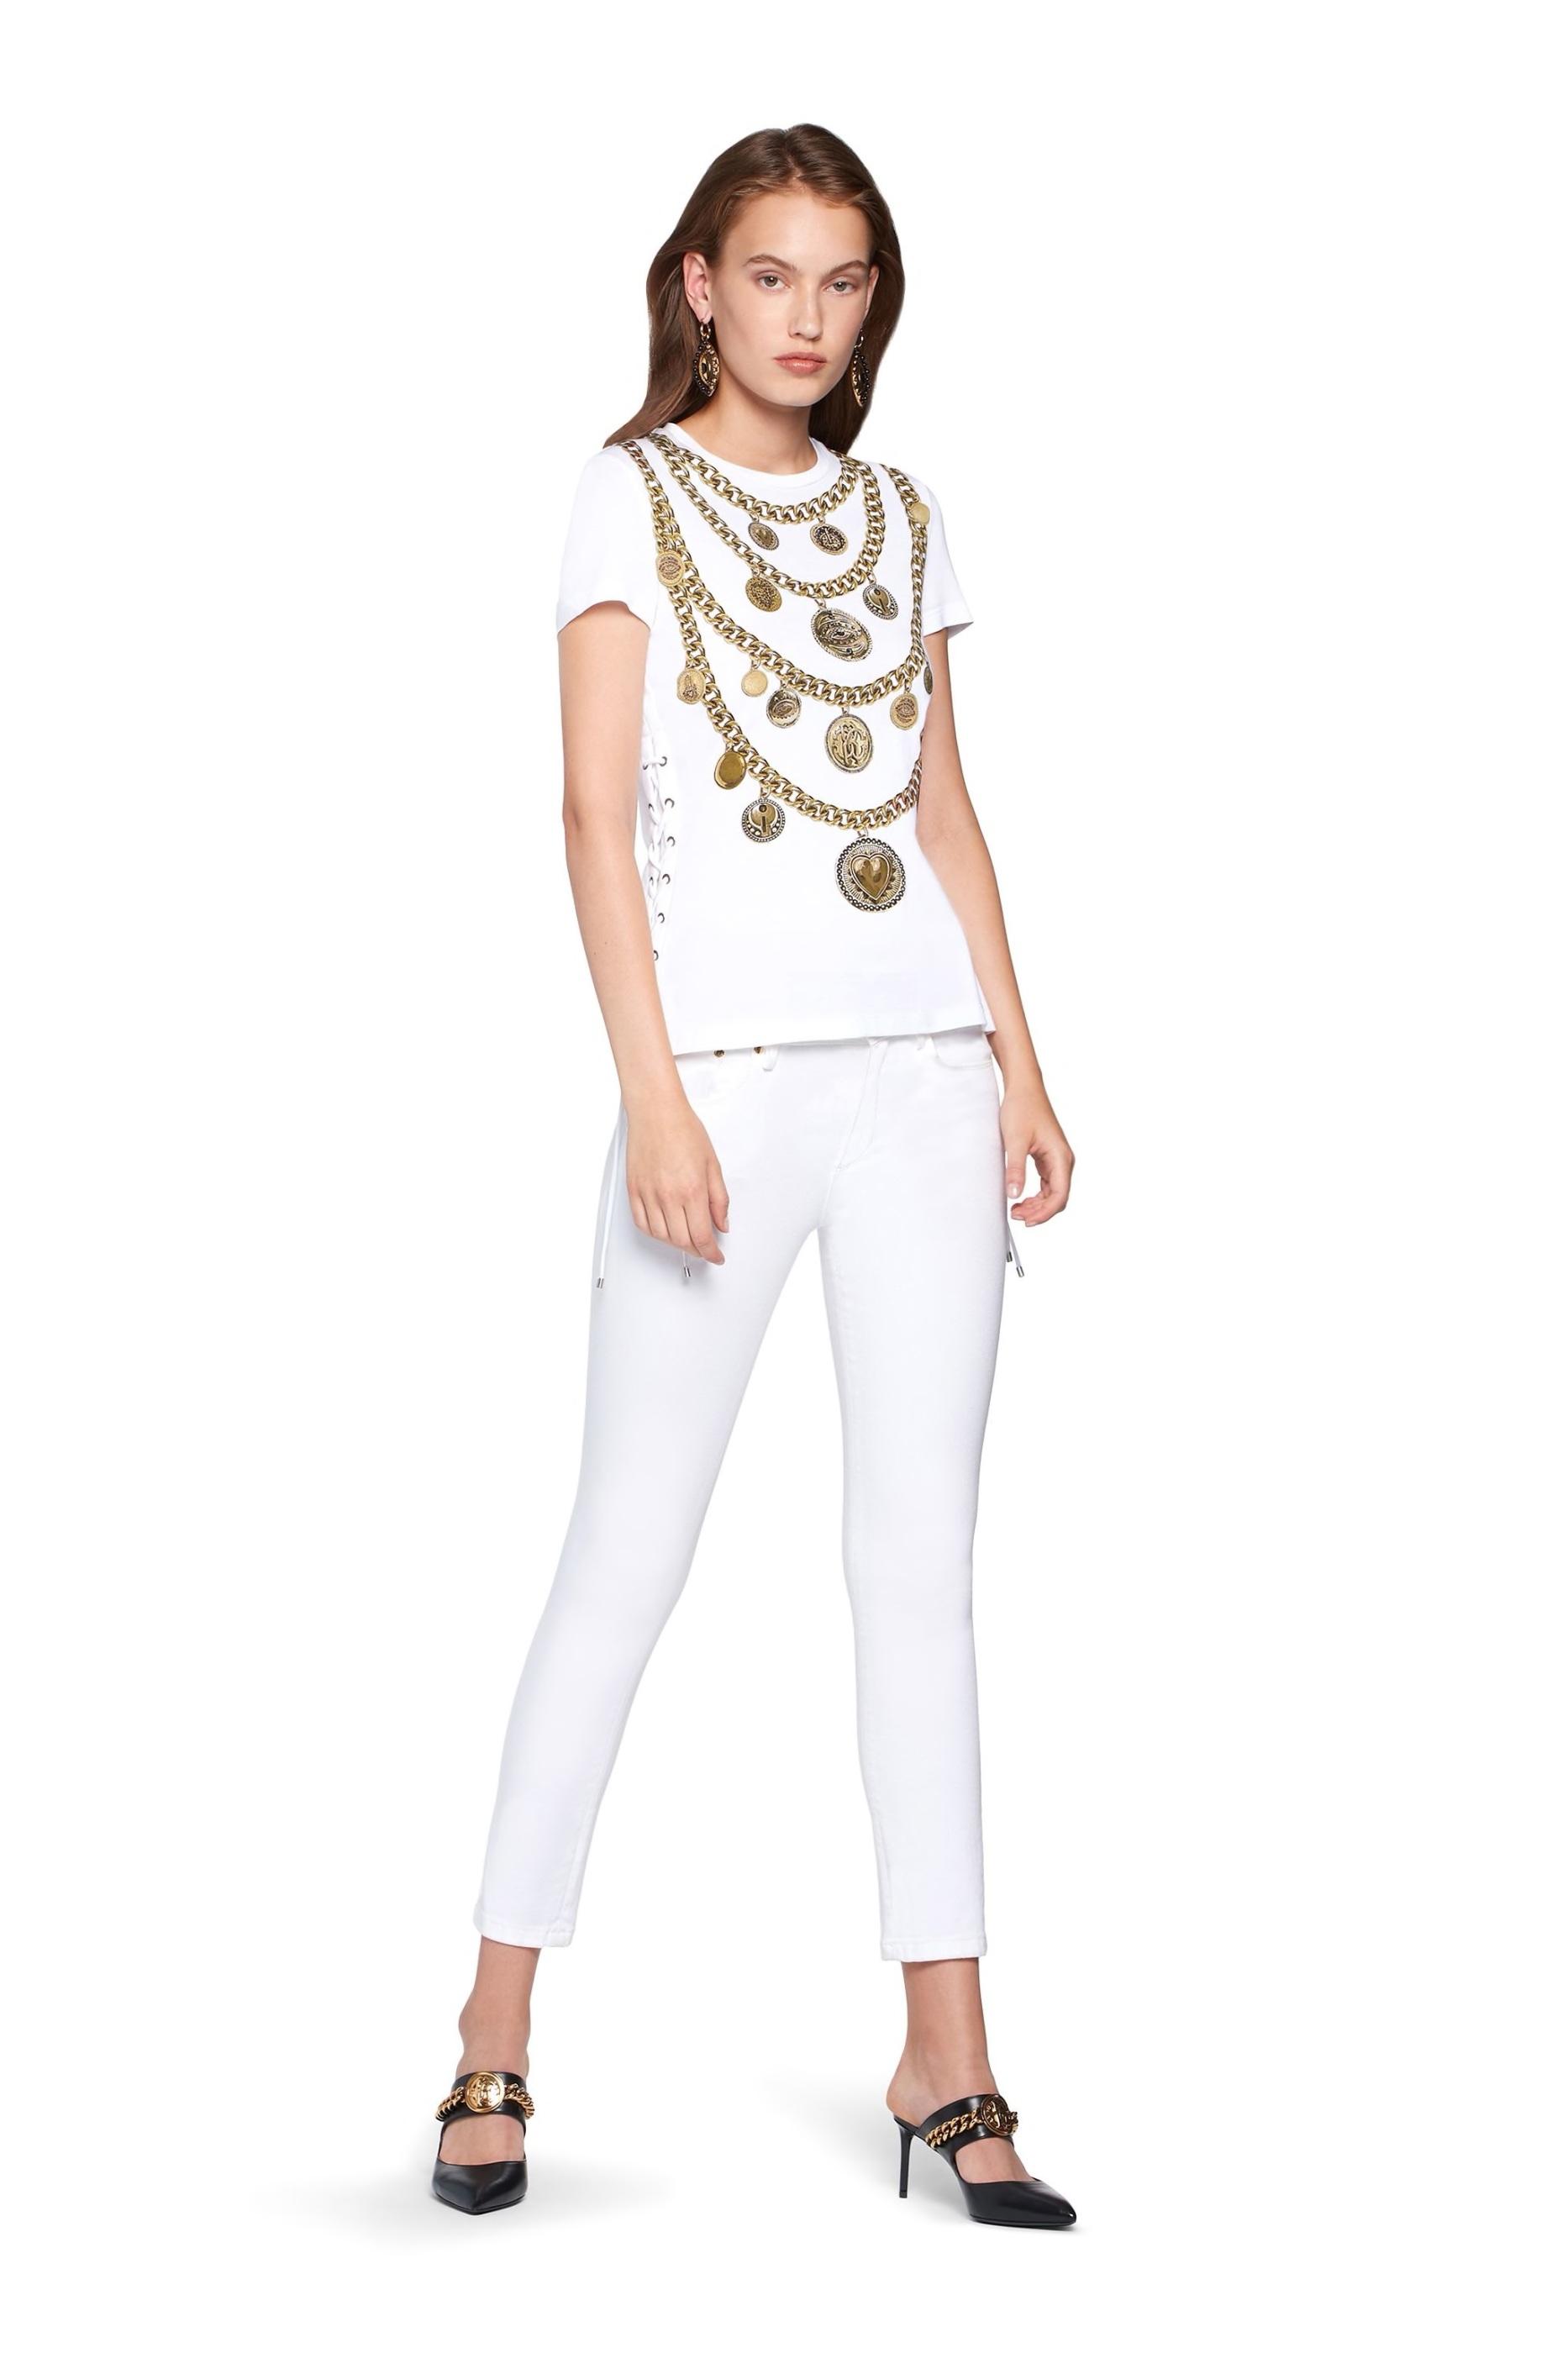 roberto-cavalli-medallion-print-t-shirt_13150805_15612856_2048.jpg